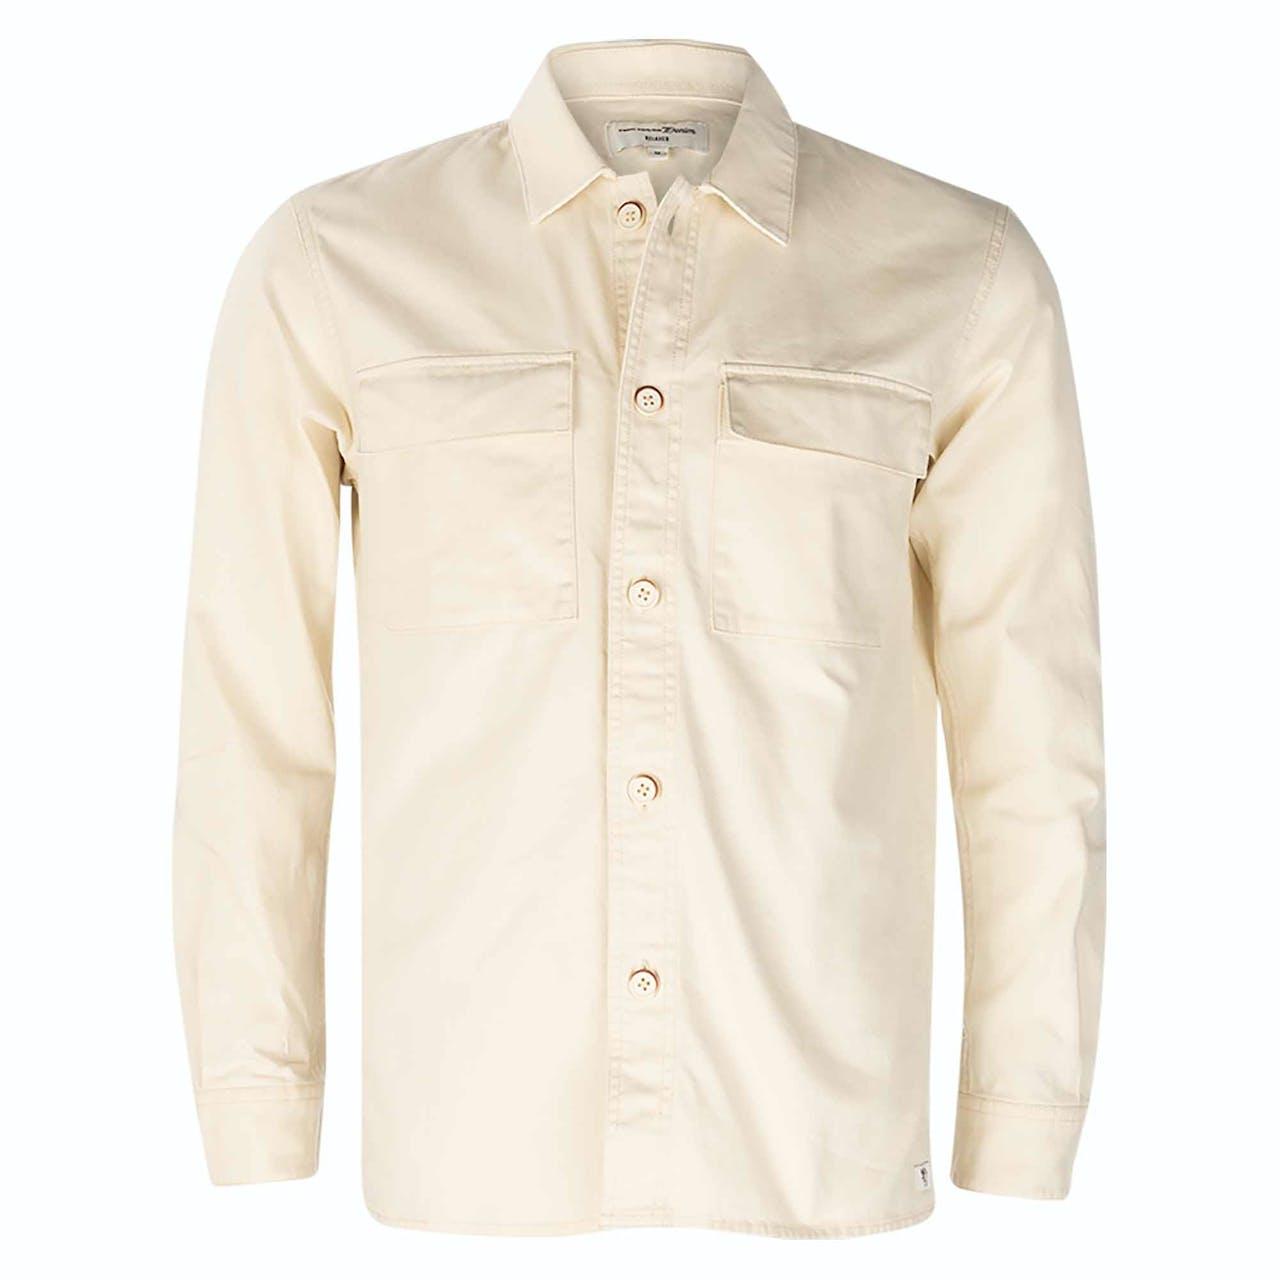 Overshirt - Regular Fit - Unifarben